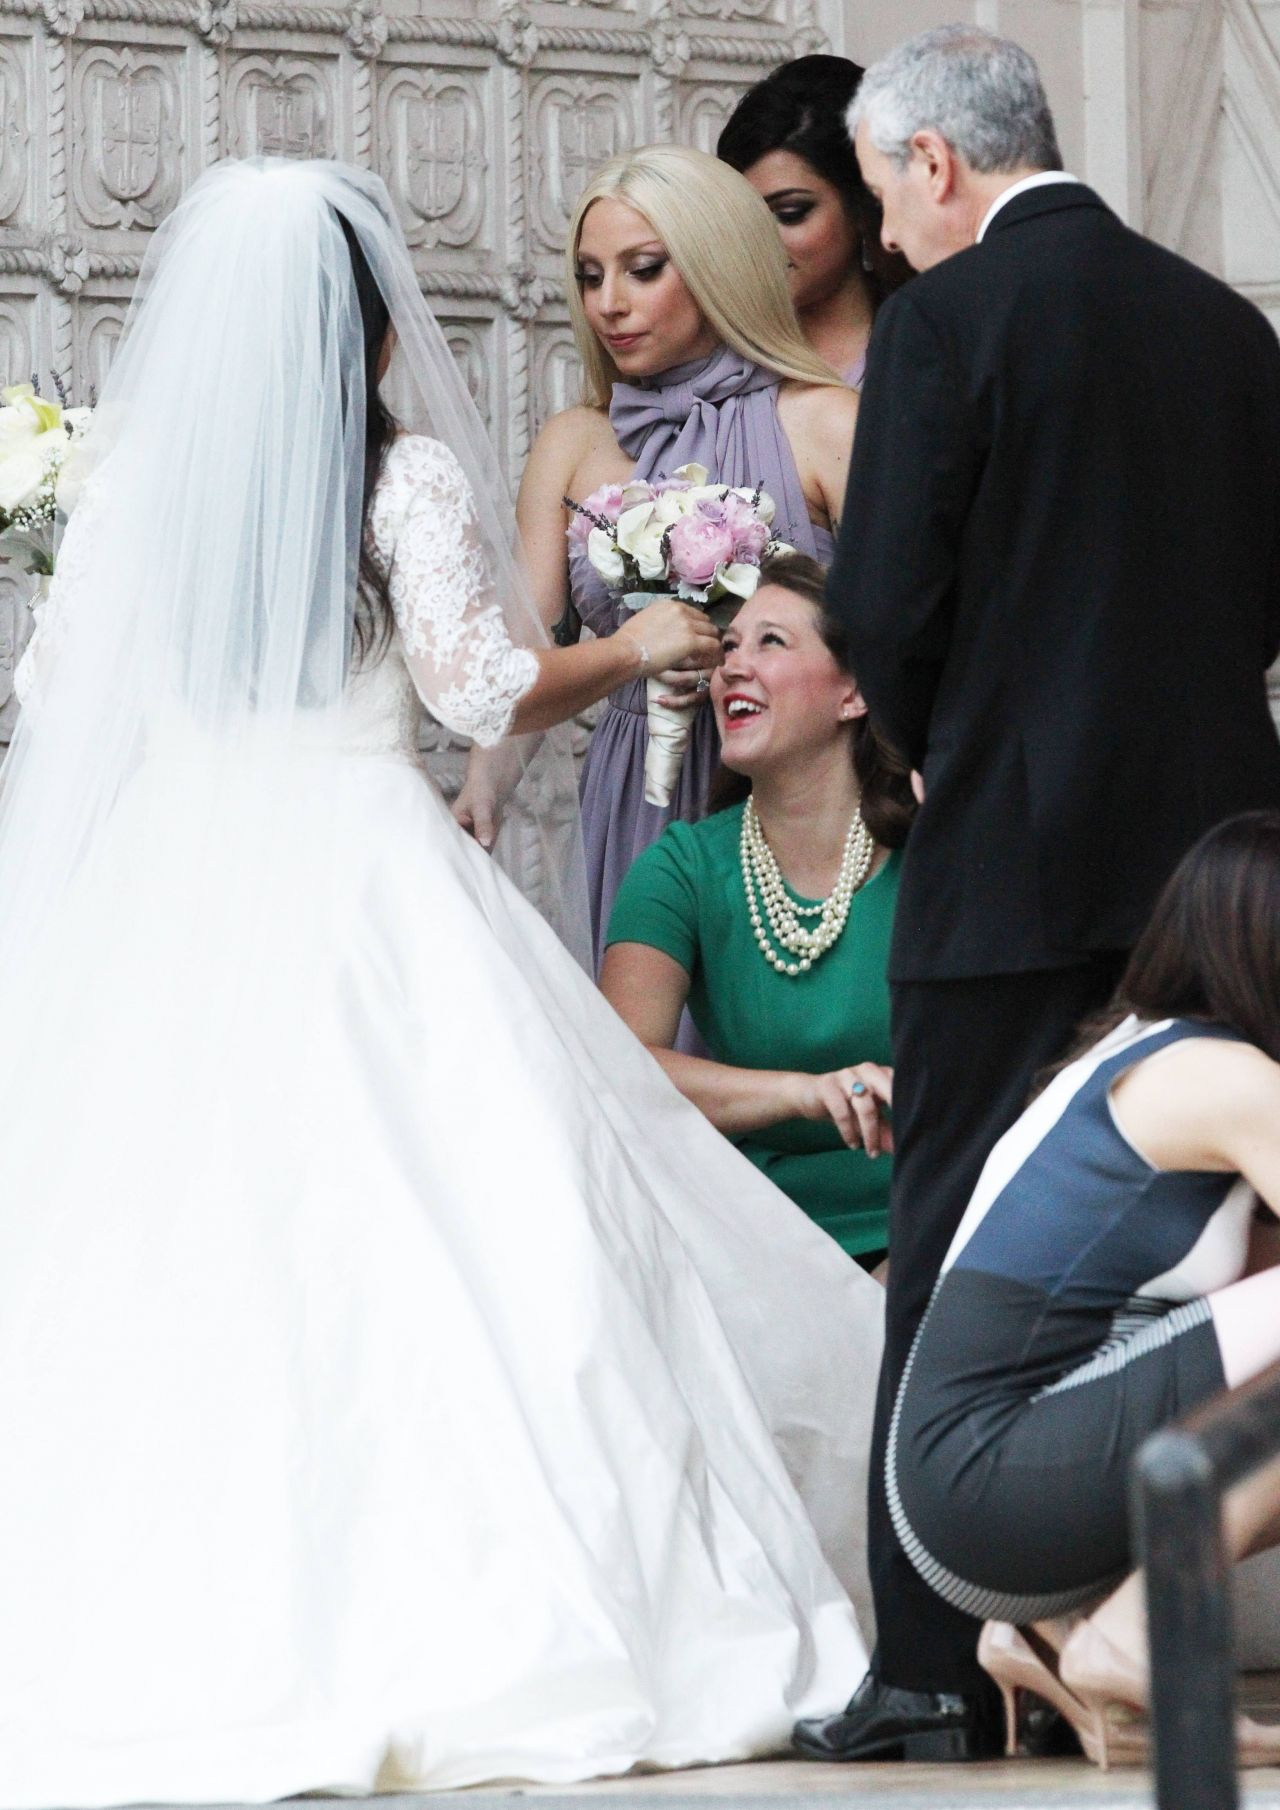 Lady bride 41 september 03